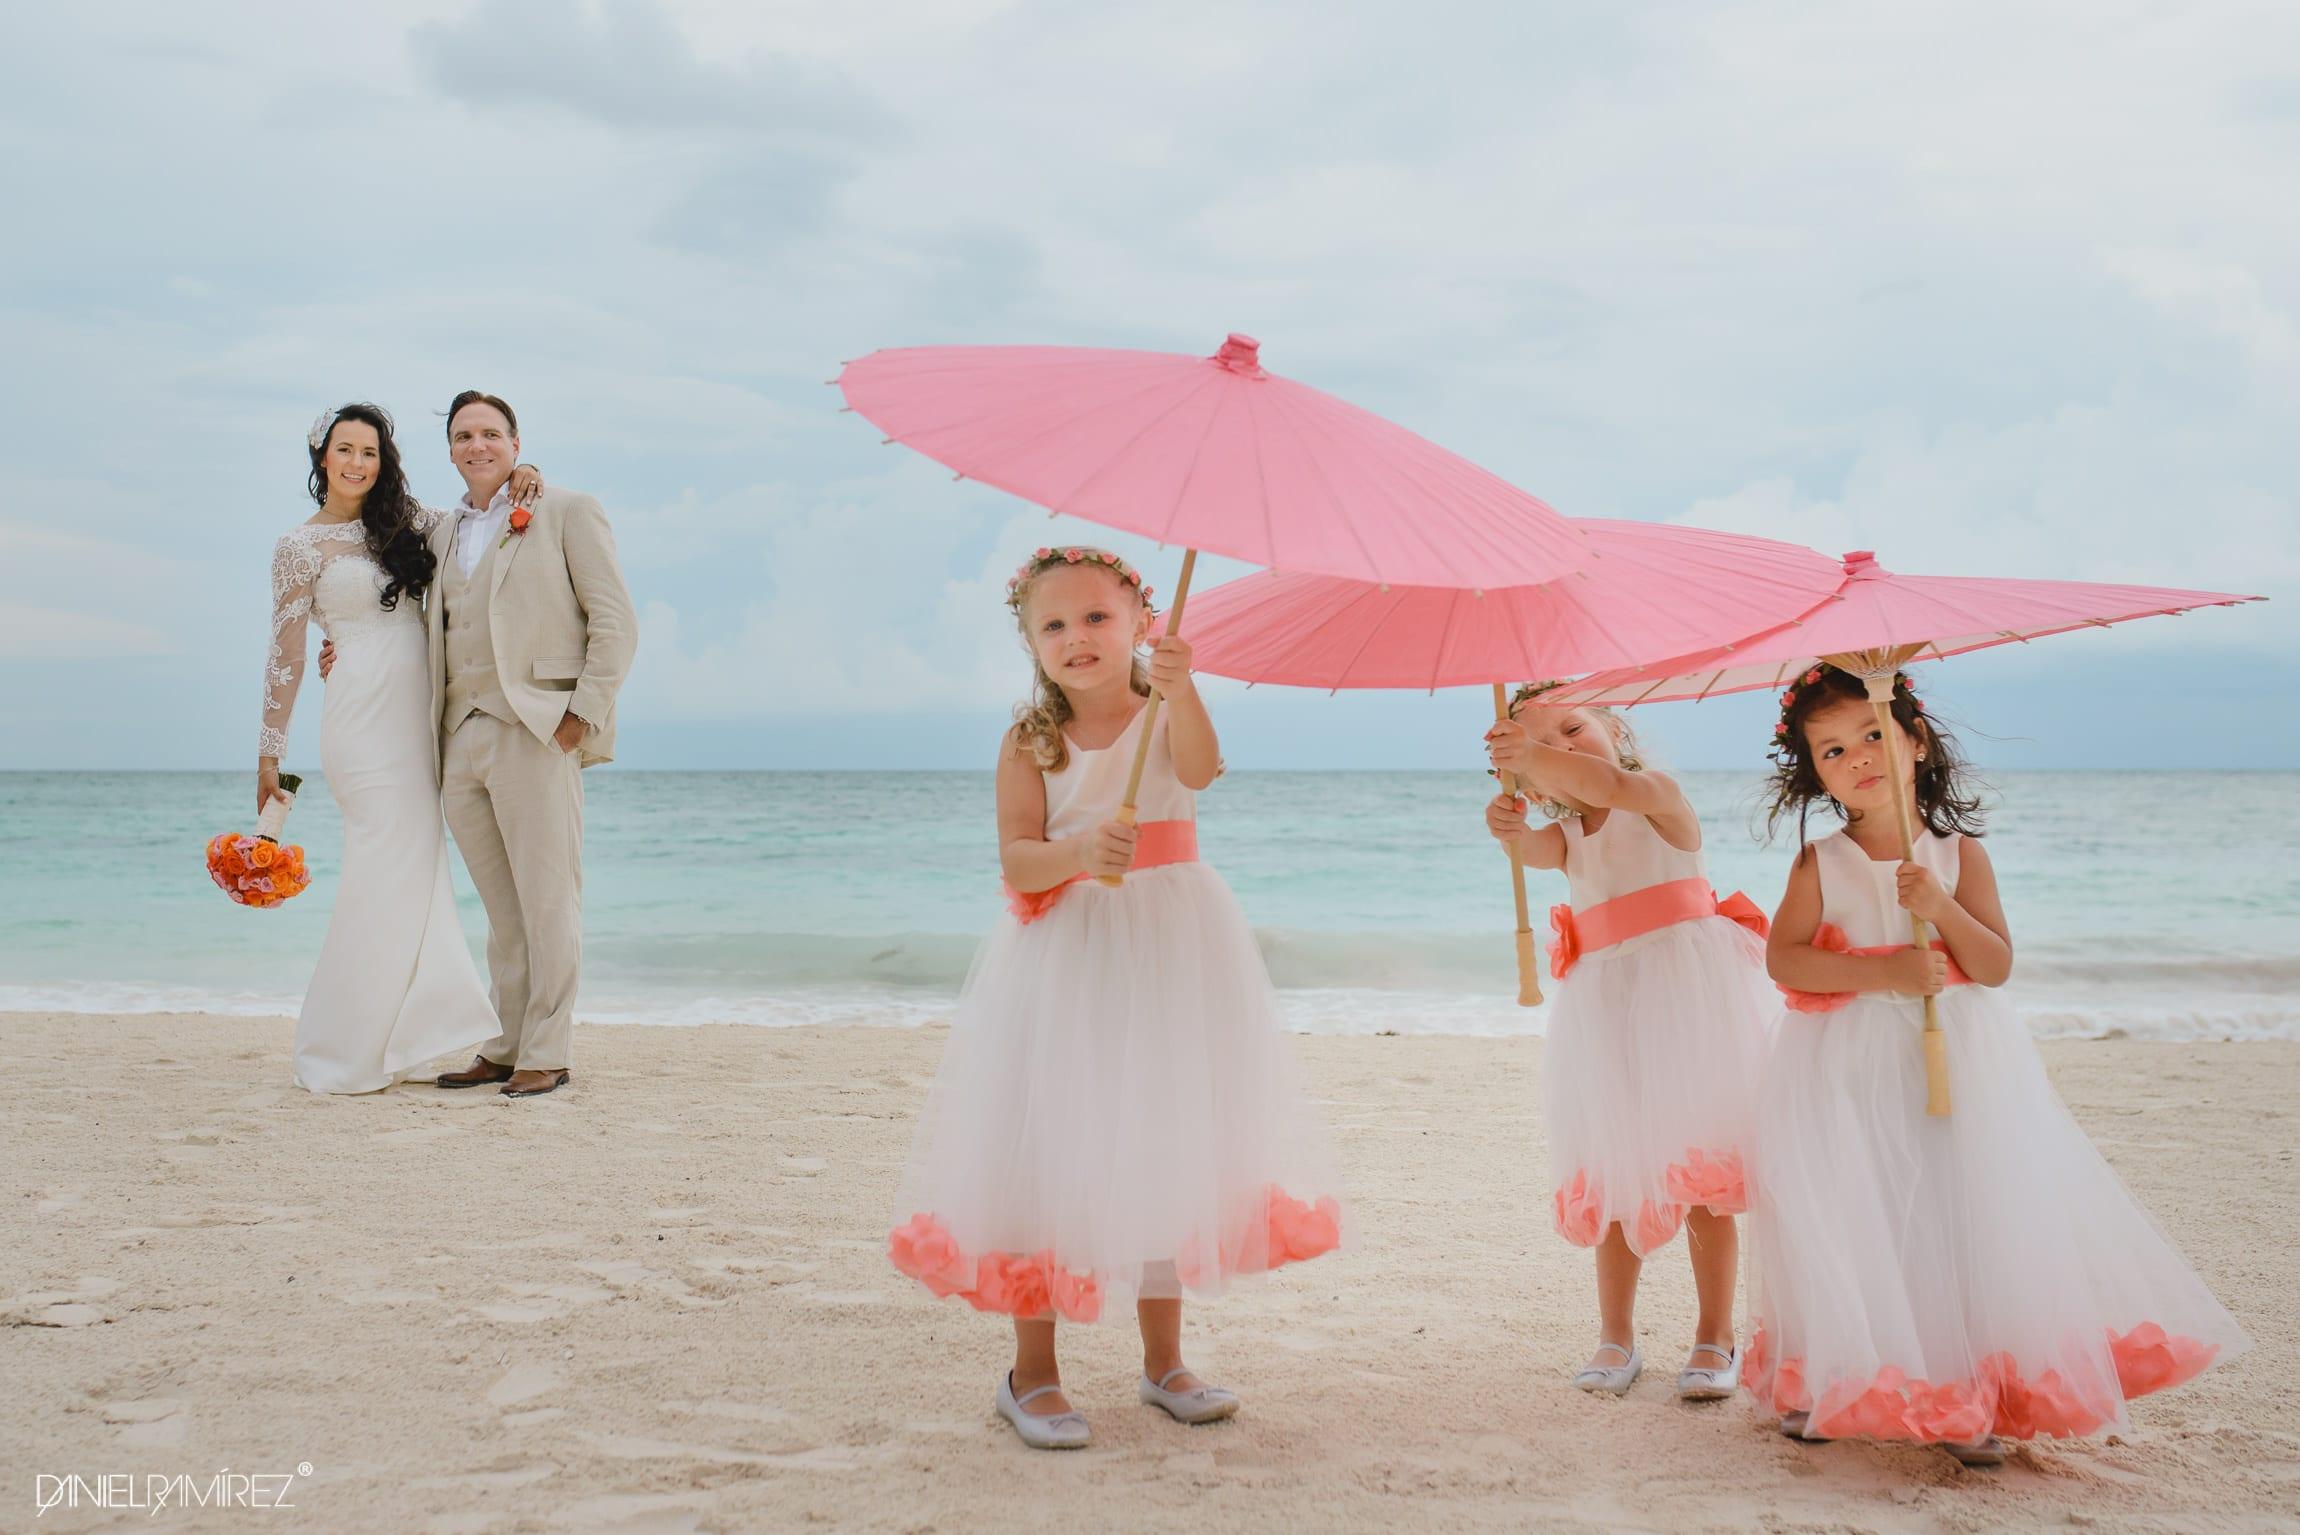 playa azul wedding ceremonies